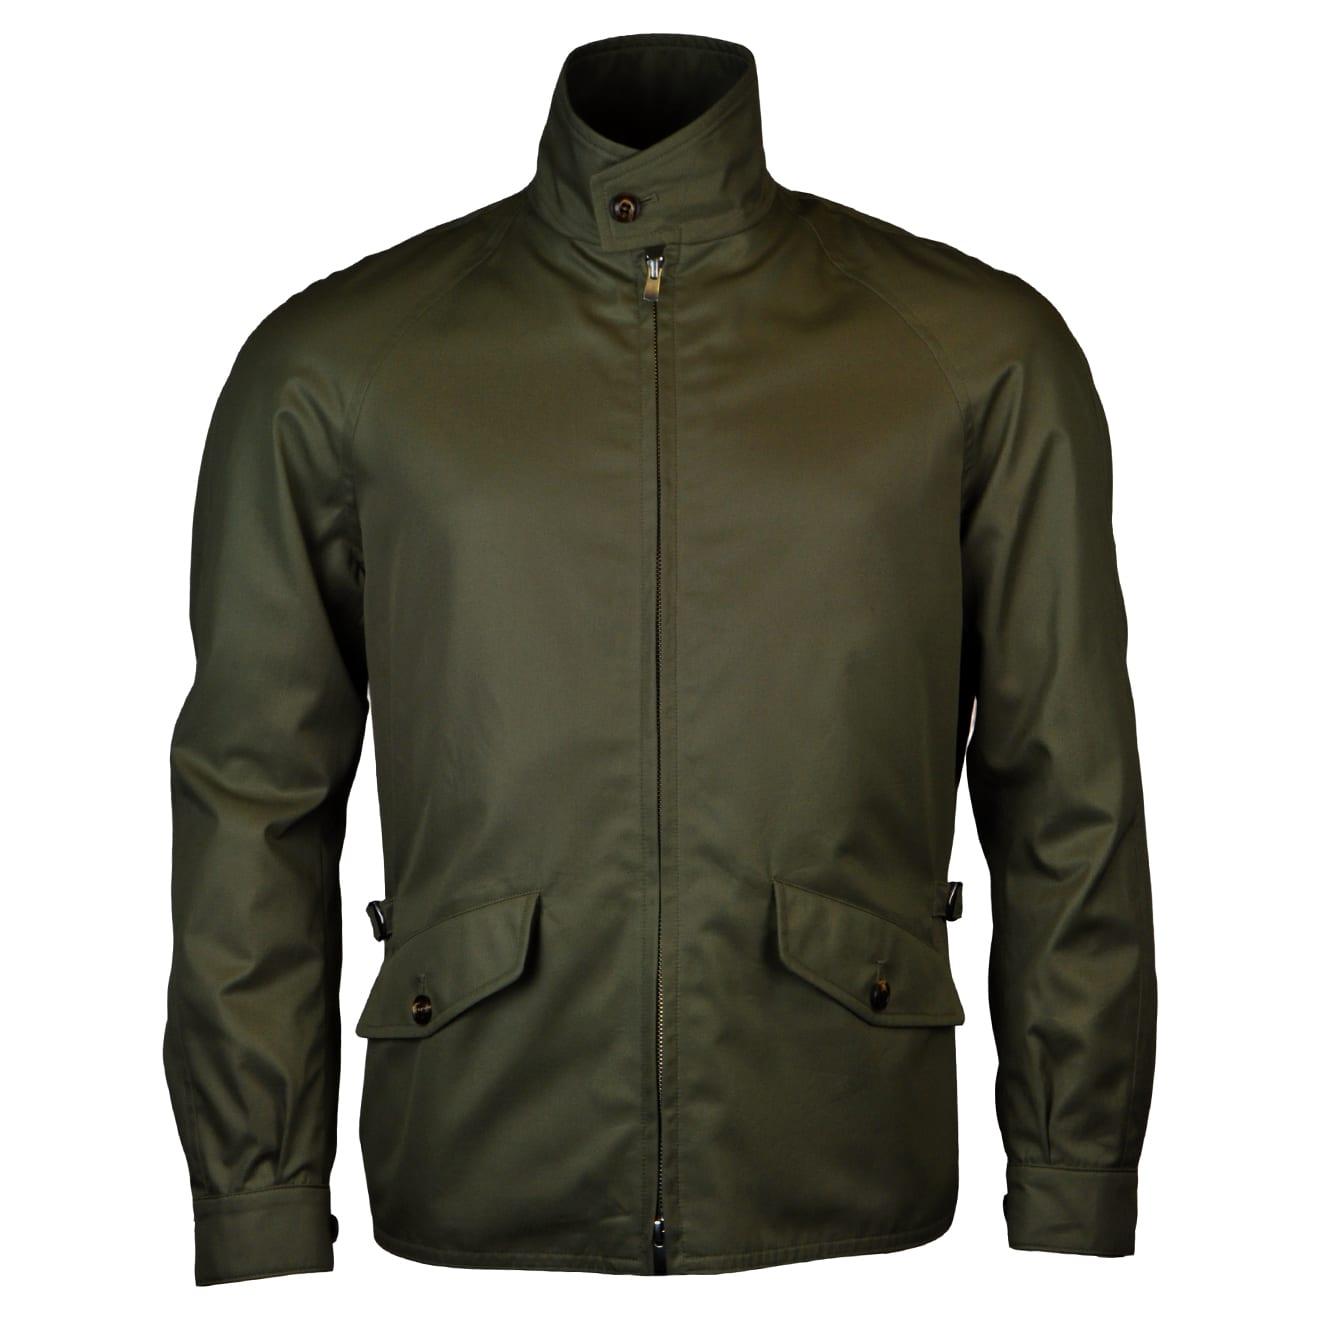 Grenfell cloth golfer jacket olive